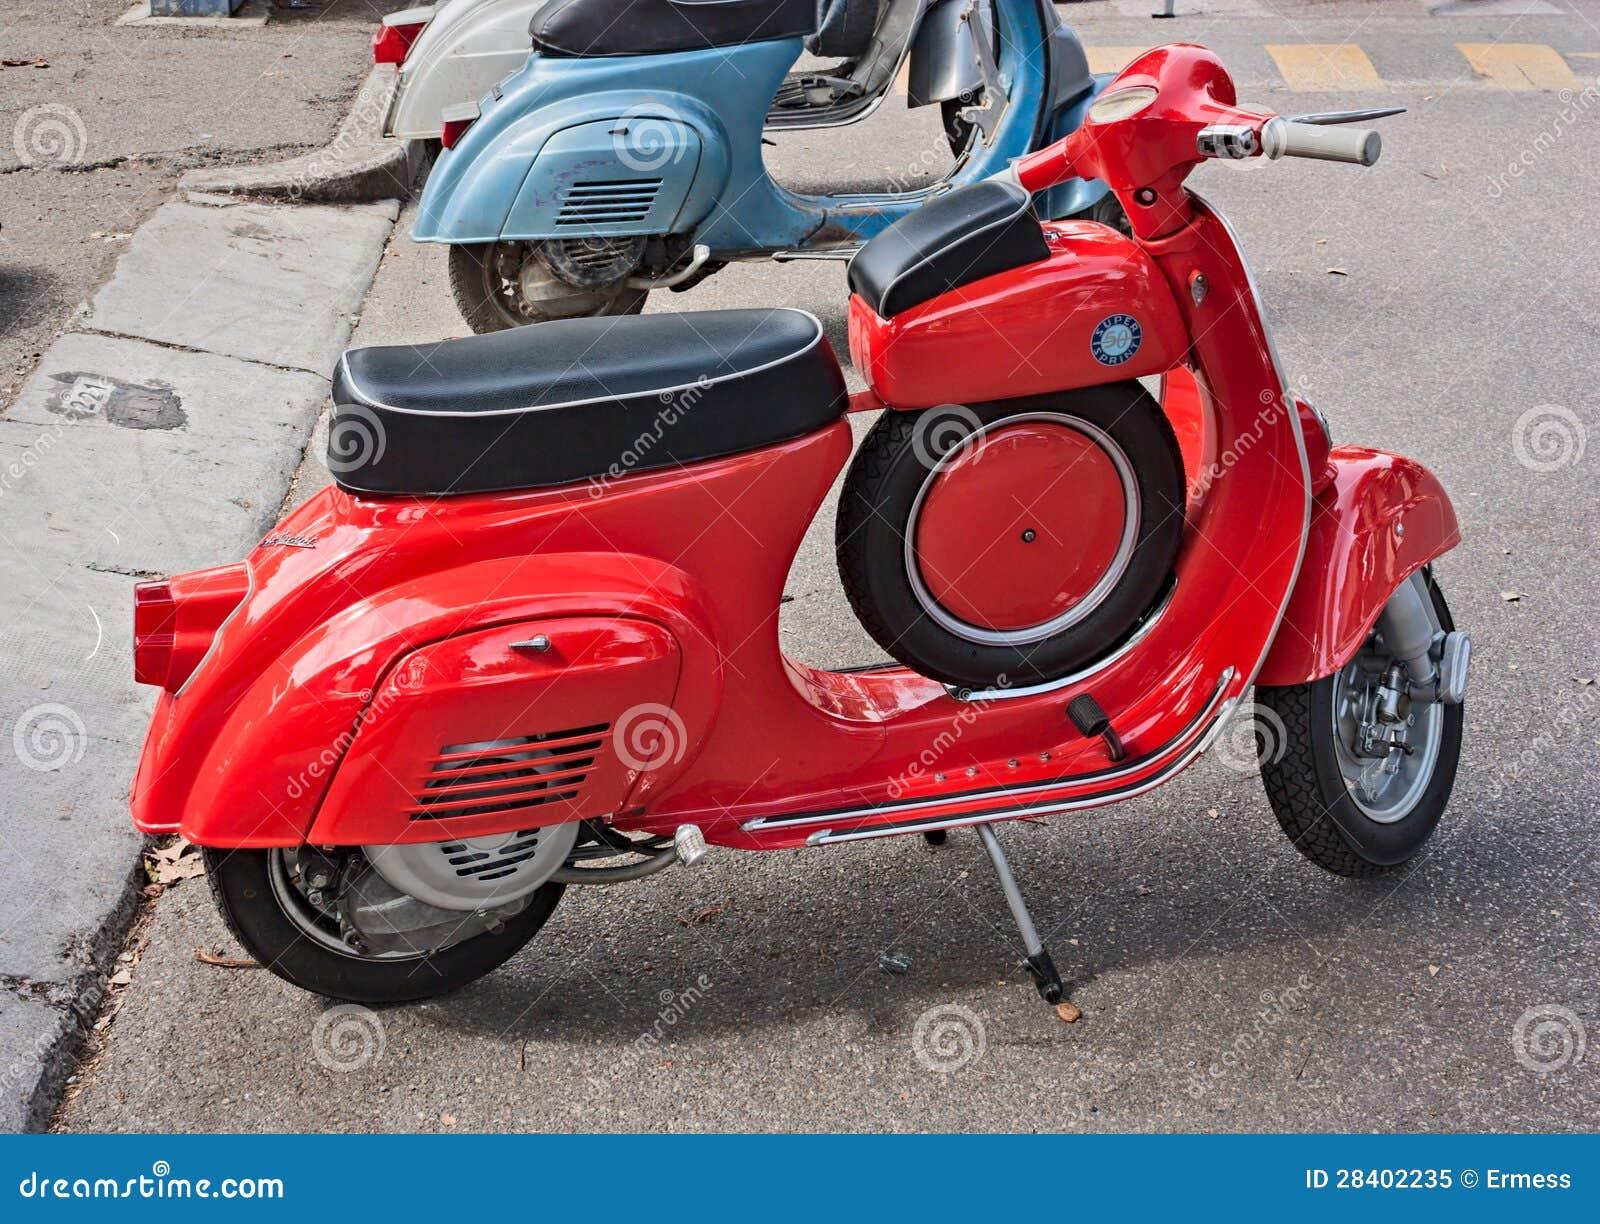 Vintage italian scooter editorial image image 28402235 for Vespa com italia